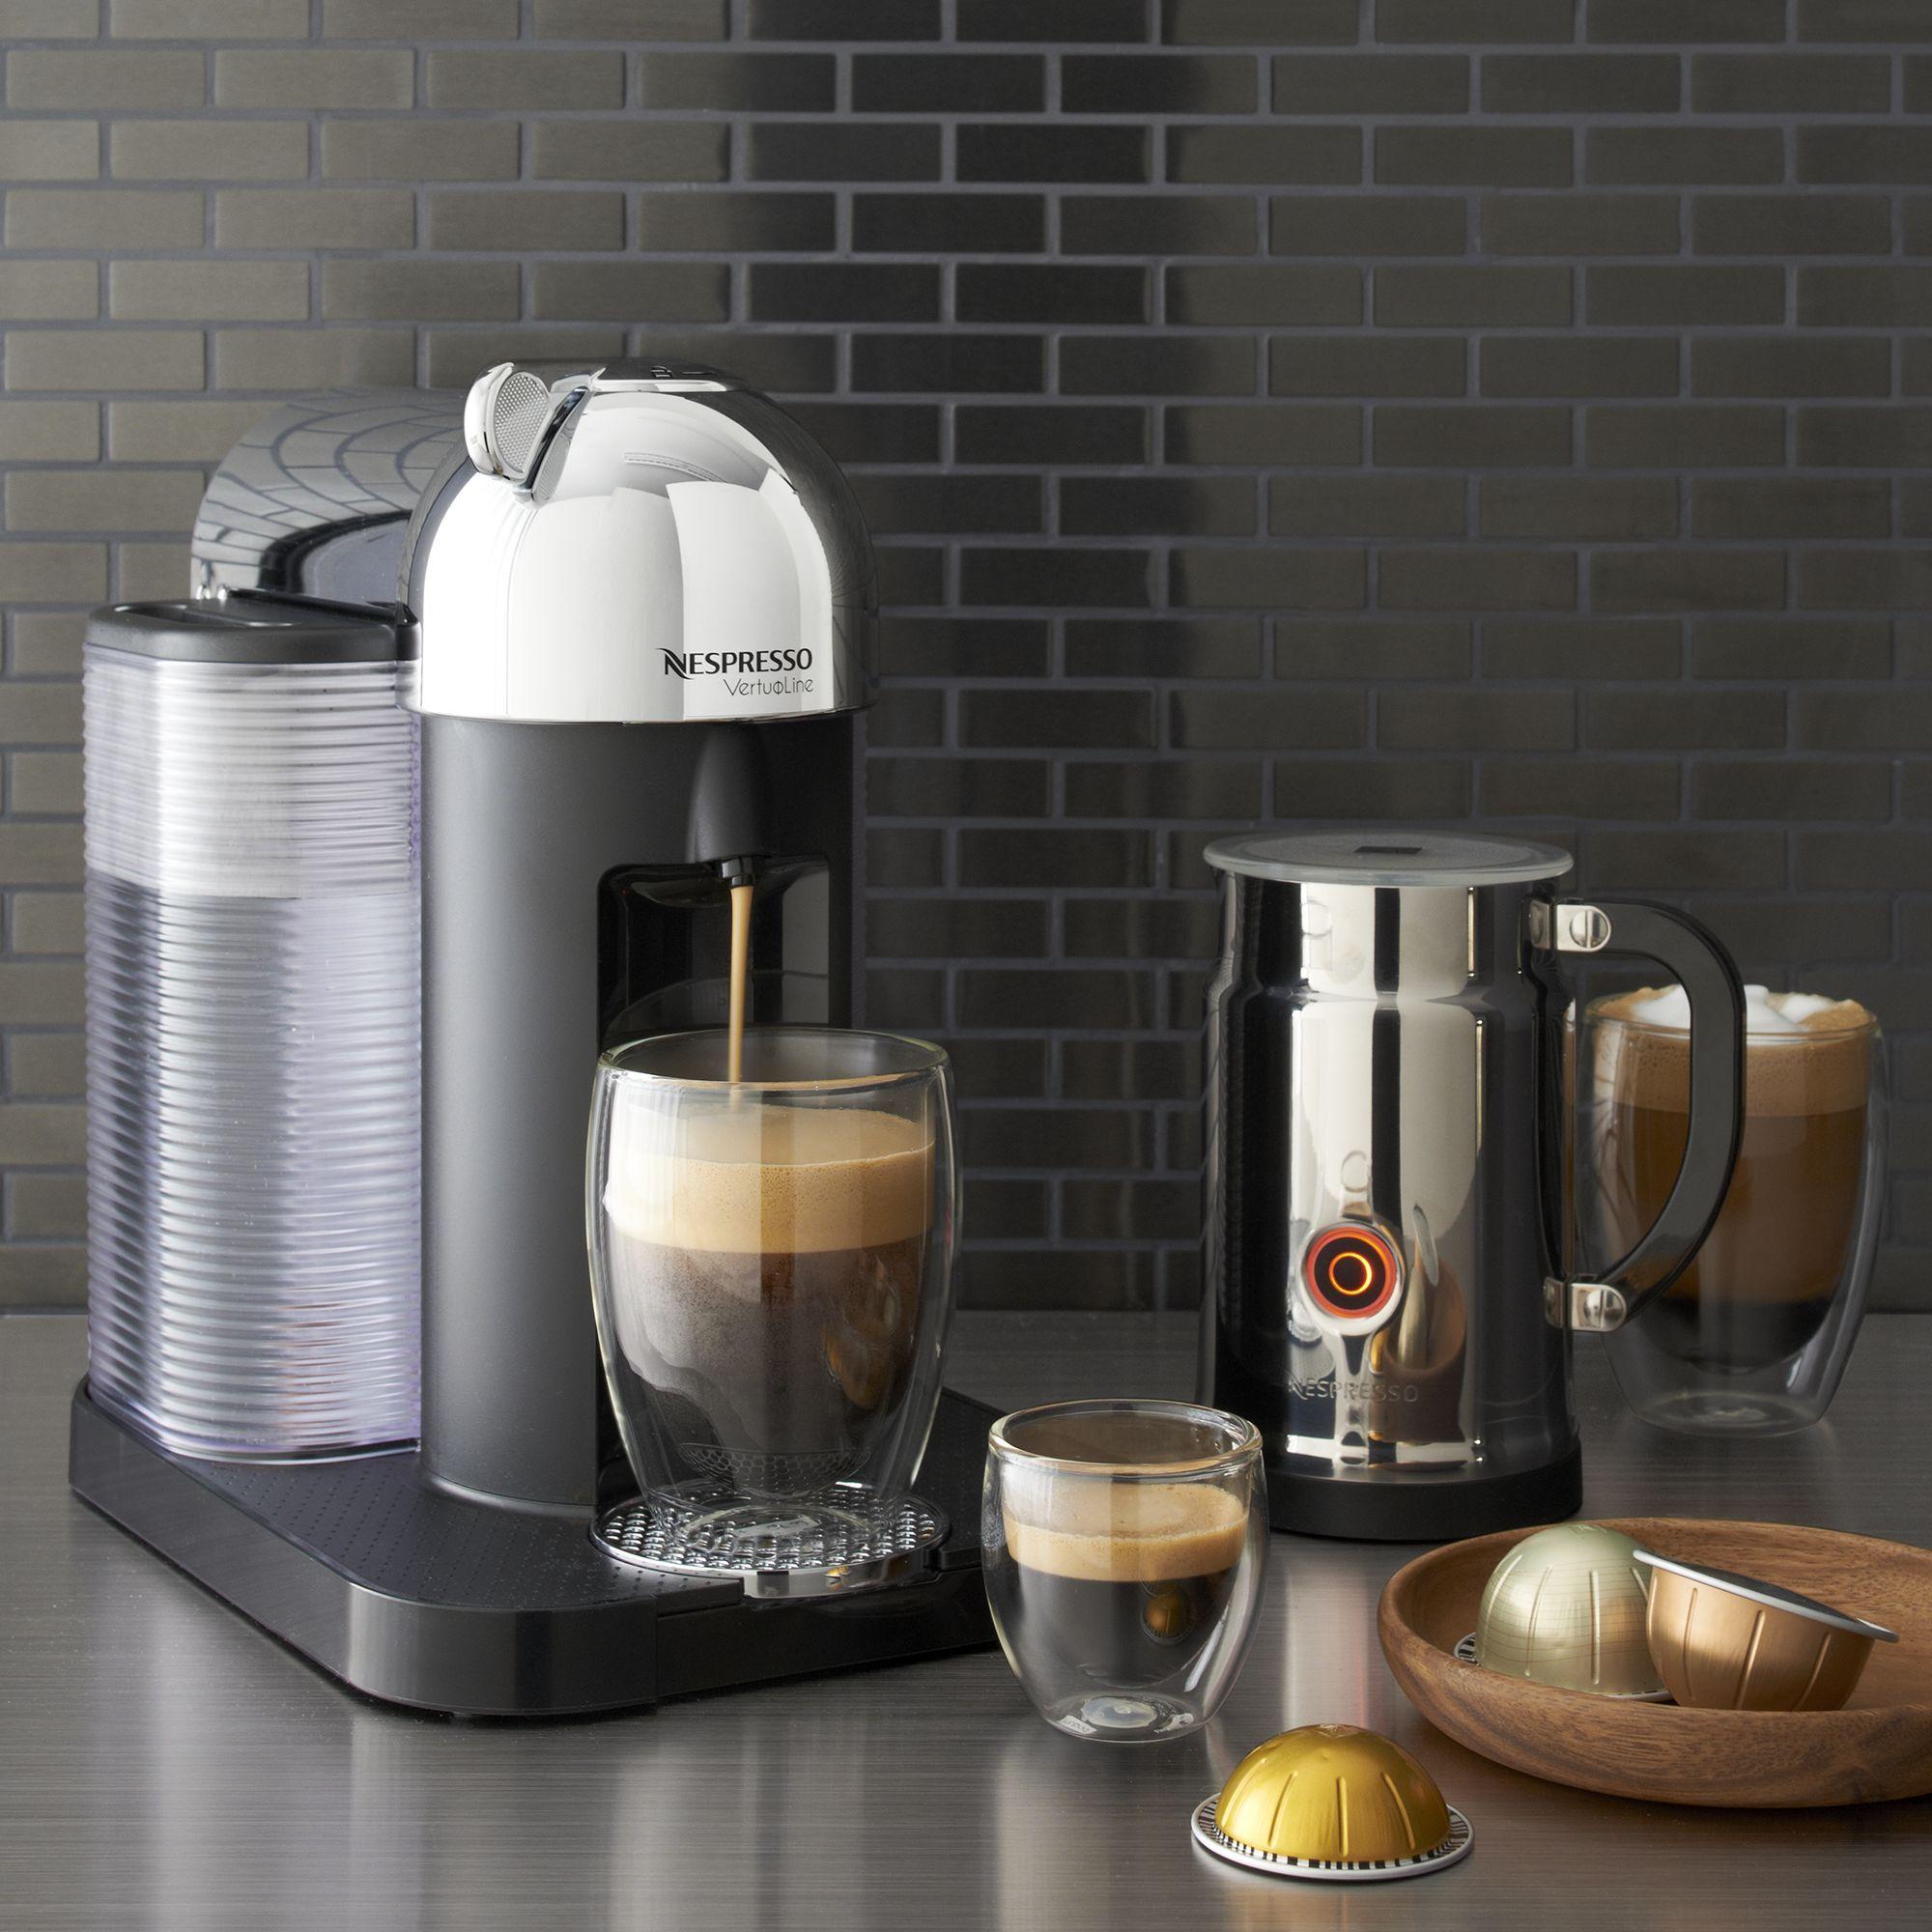 Nespresso By Breville Vertuoline Chrome Coffee Espresso Maker Bundle Reviews Crate And Barrel Nespresso Coffee Vertuoline